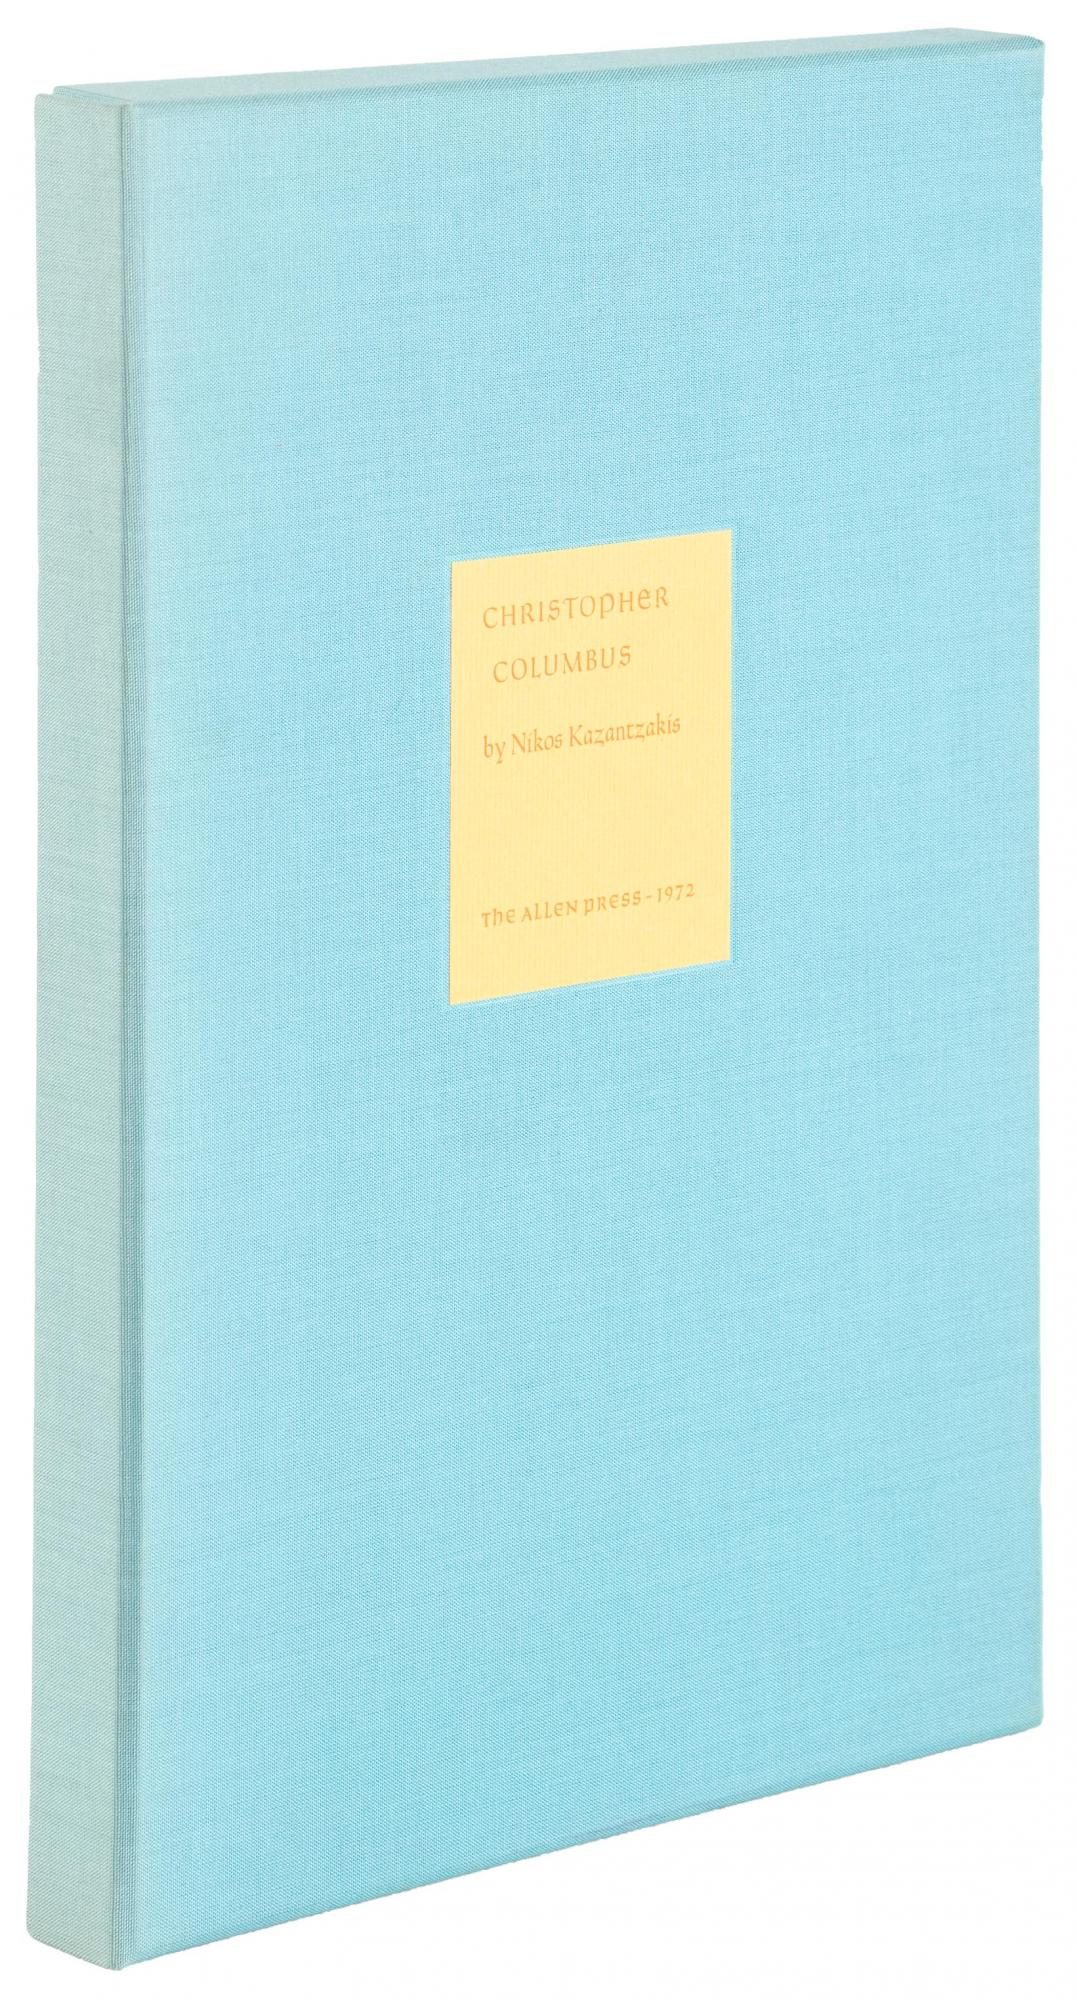 Fine Books - Fine Press - Fine Bindings - With a Taste of Golf